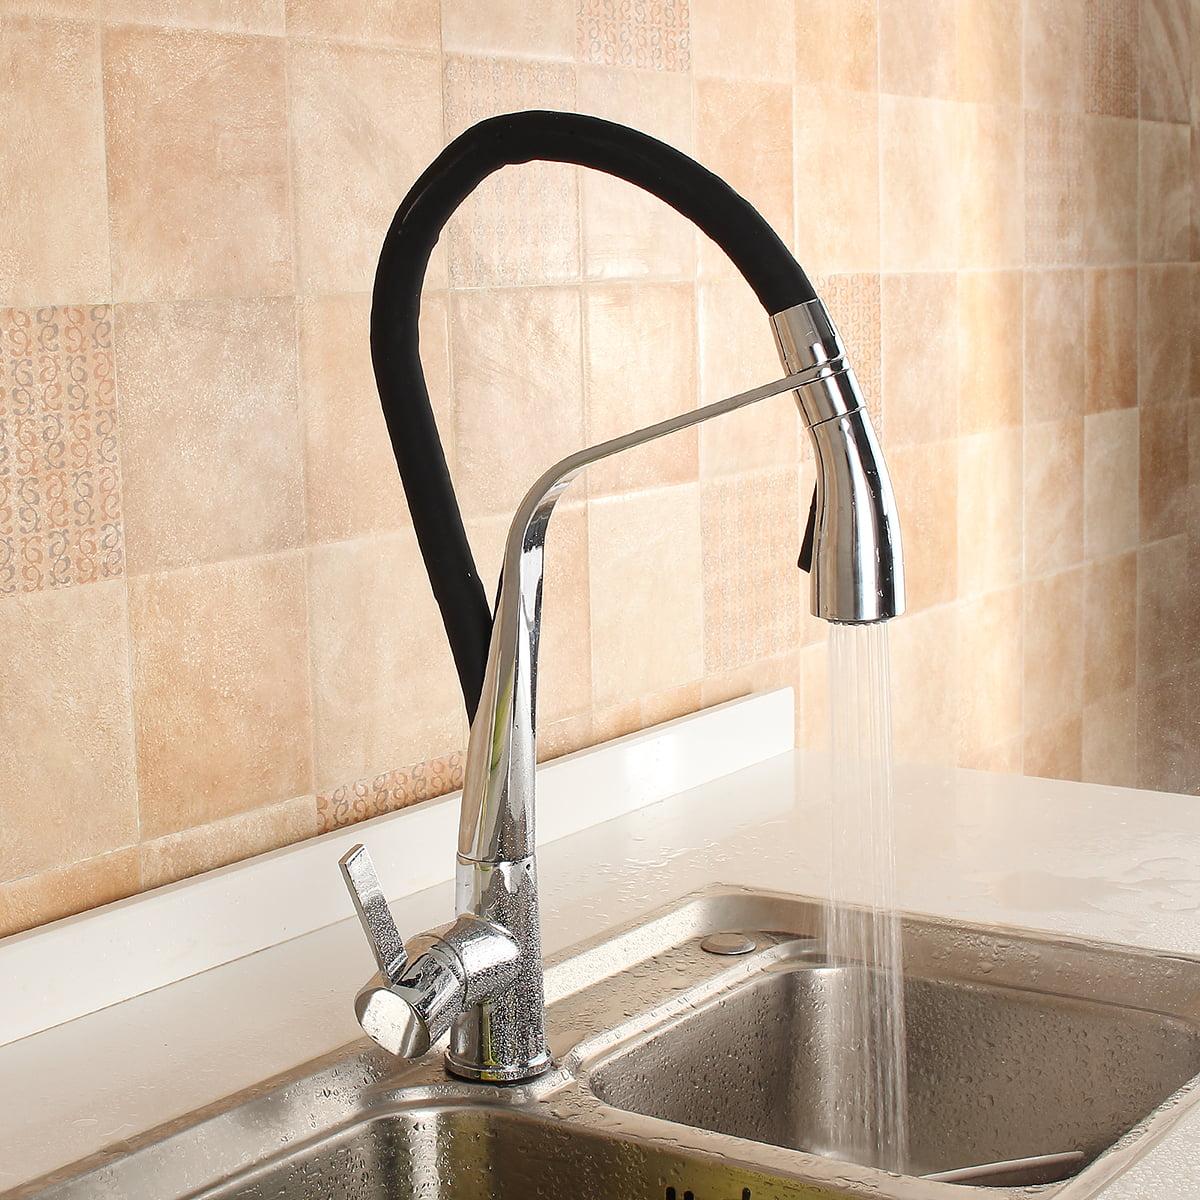 Single Handle Kitchen Faucet Pull Out Sprayer Swivel Sink Mixer Matt black